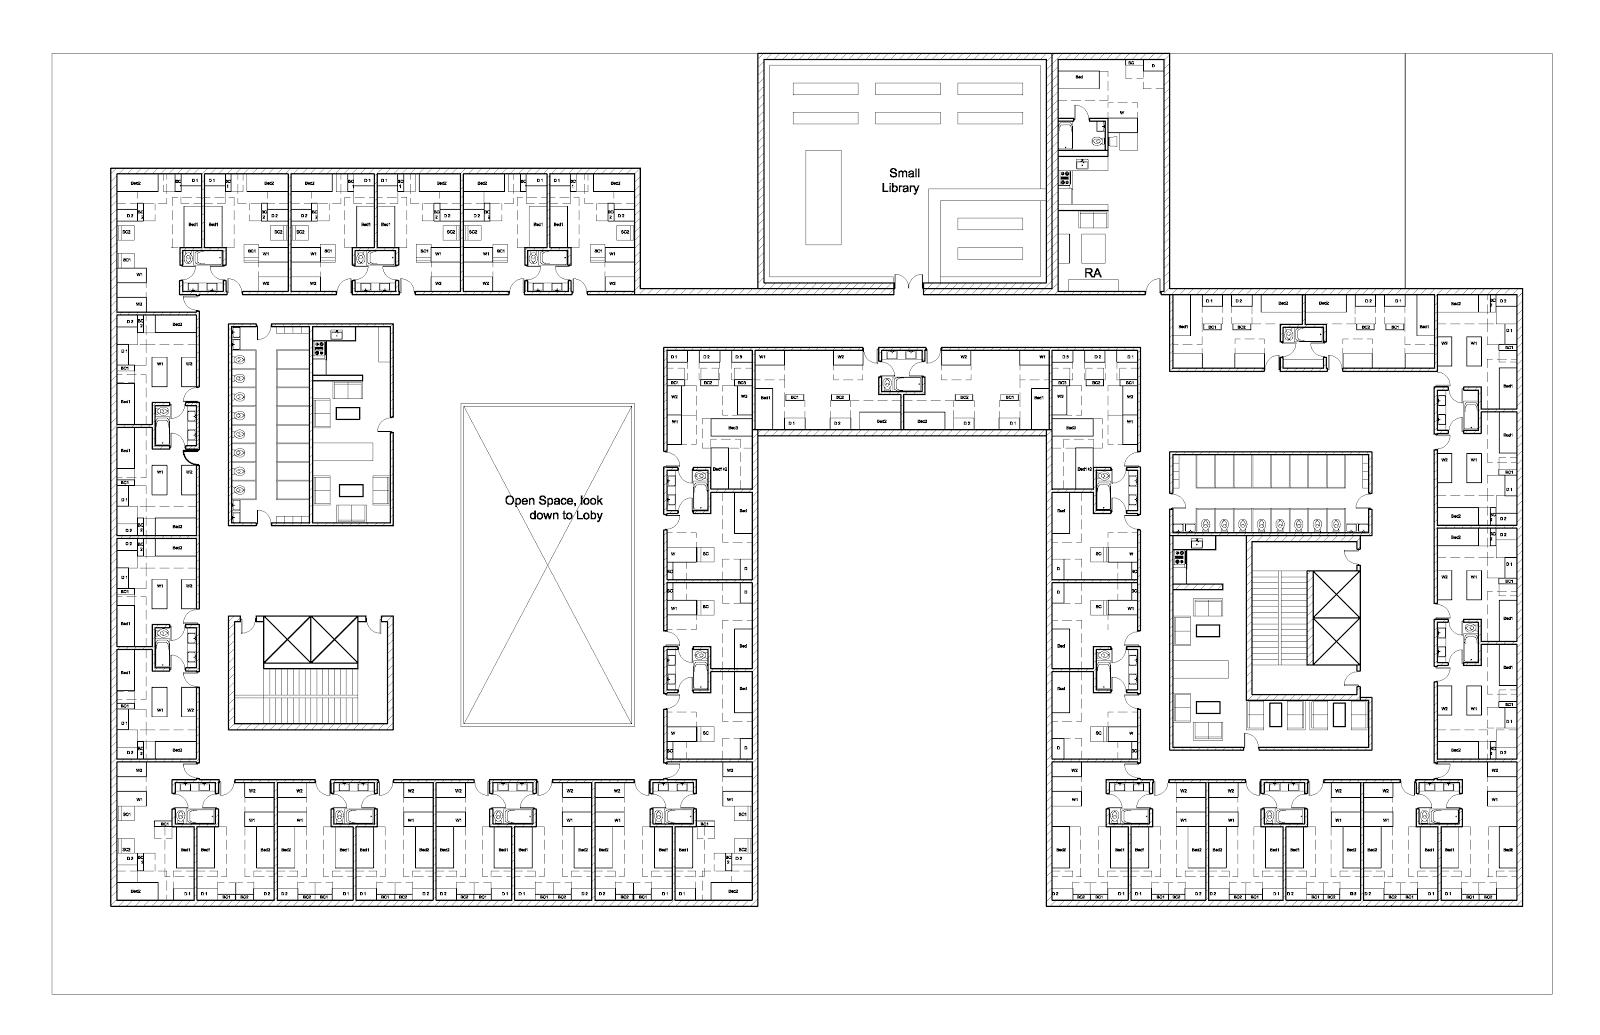 Jack And Jill Floor Plans Arch3611f12trungnguyen Floor Plan Continue